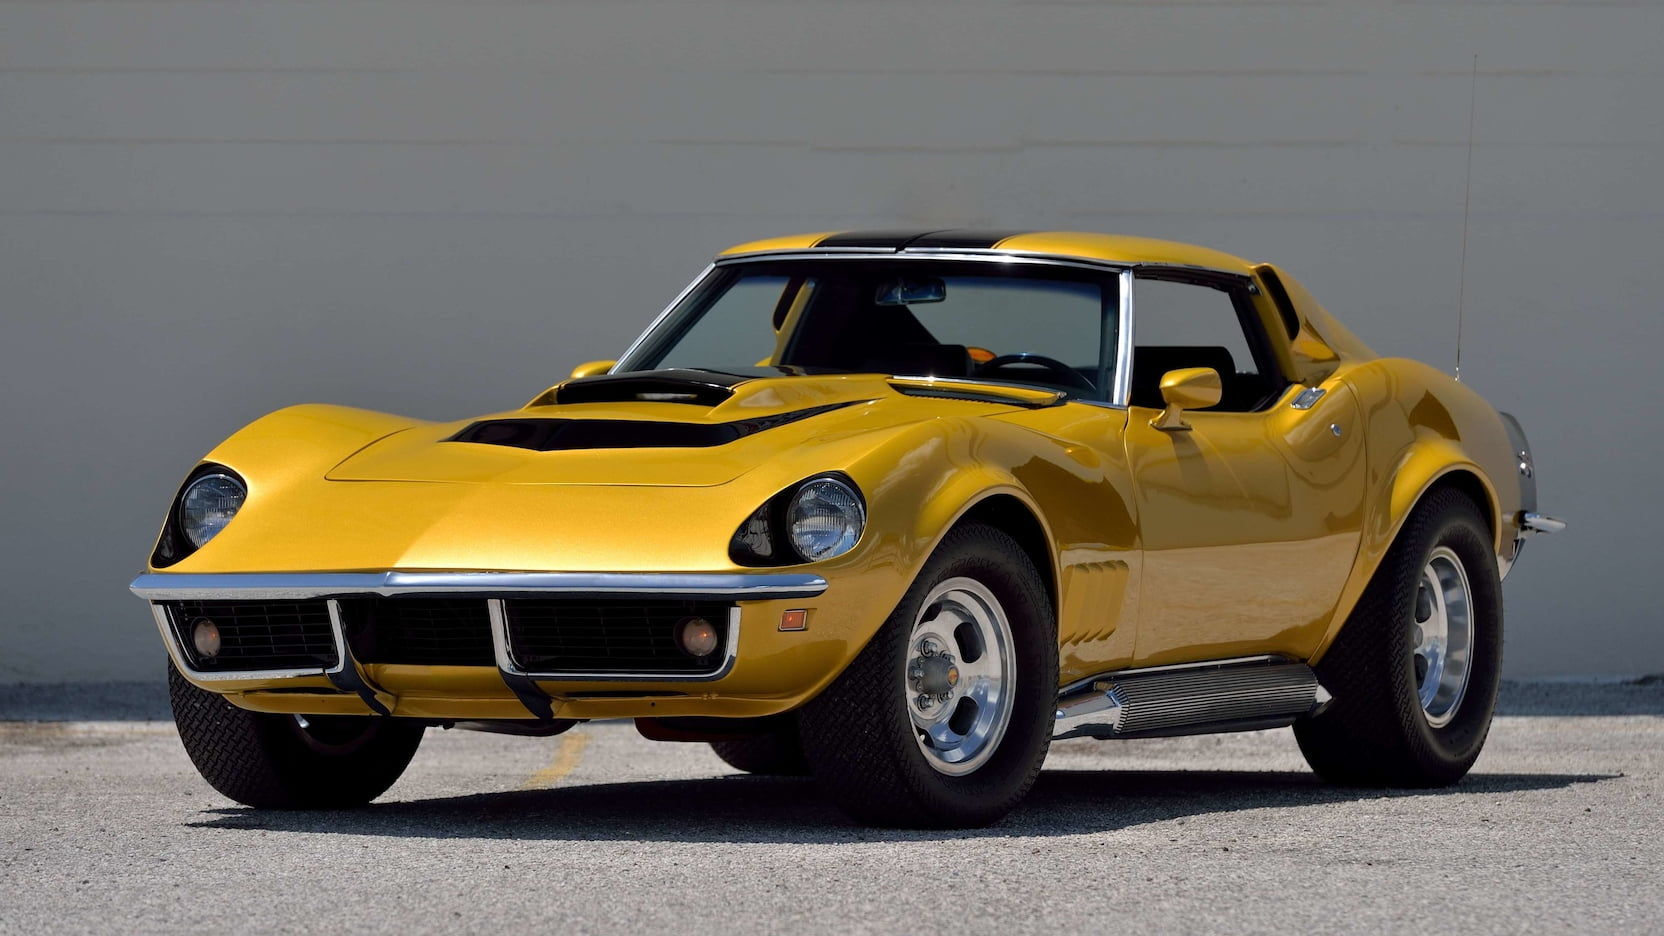 1969 Chevrolet Corvette Baldwin Motion Phase III GT